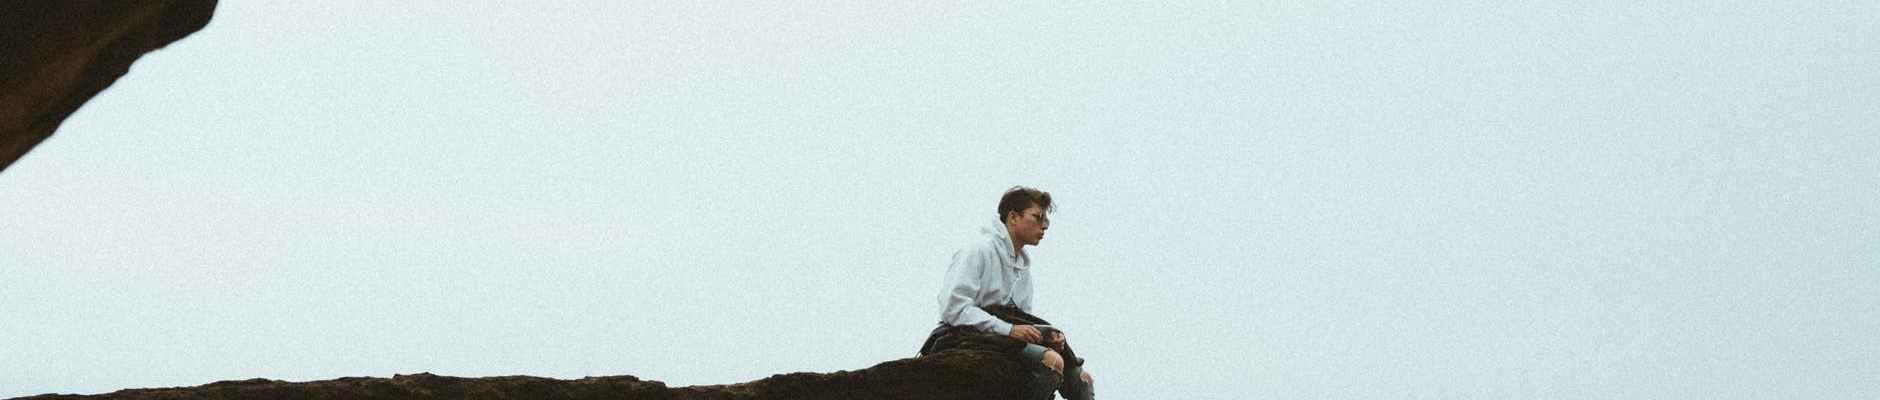 calm man on edge of cliff above ocean